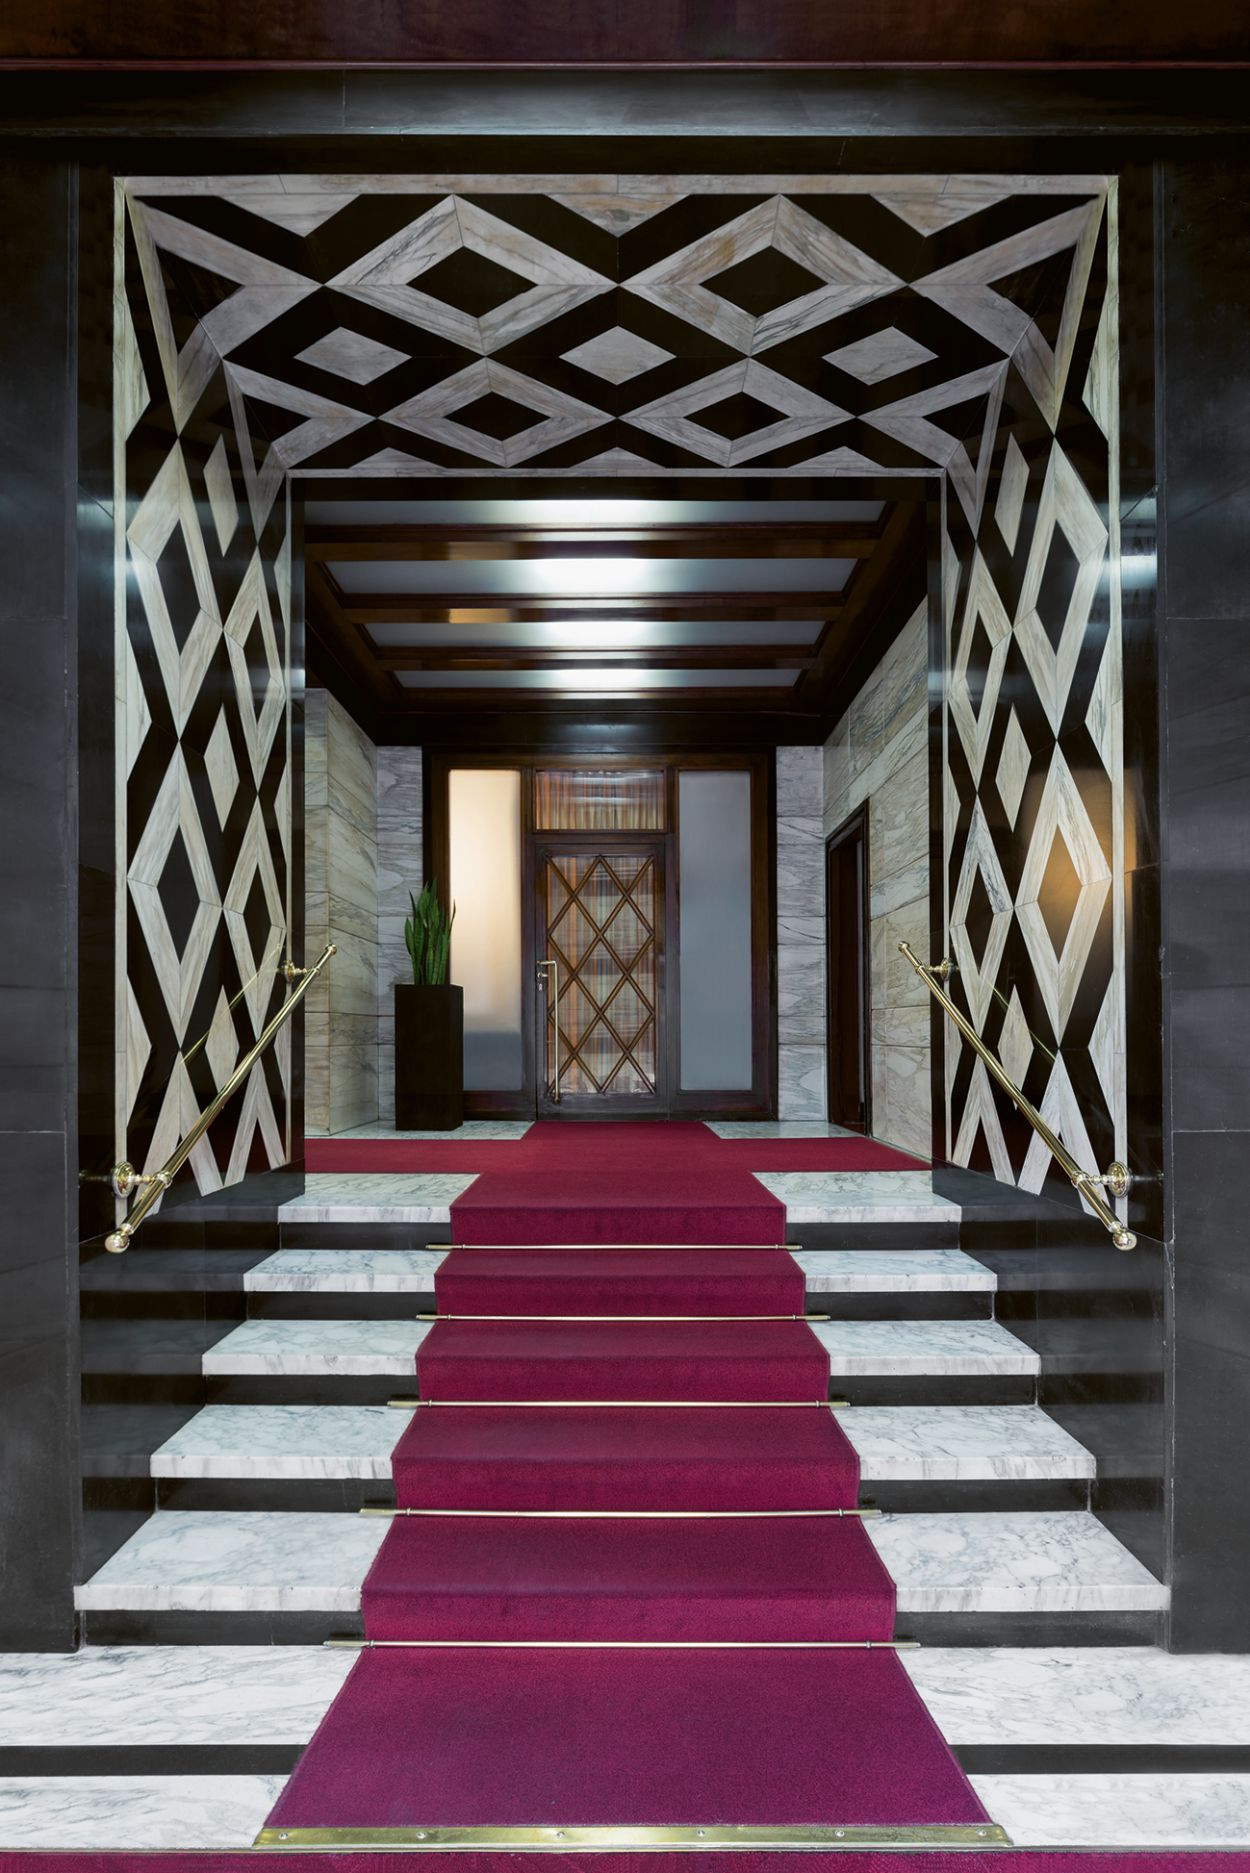 Eingangshalle, Fotografieband, Architektur, Modernismus